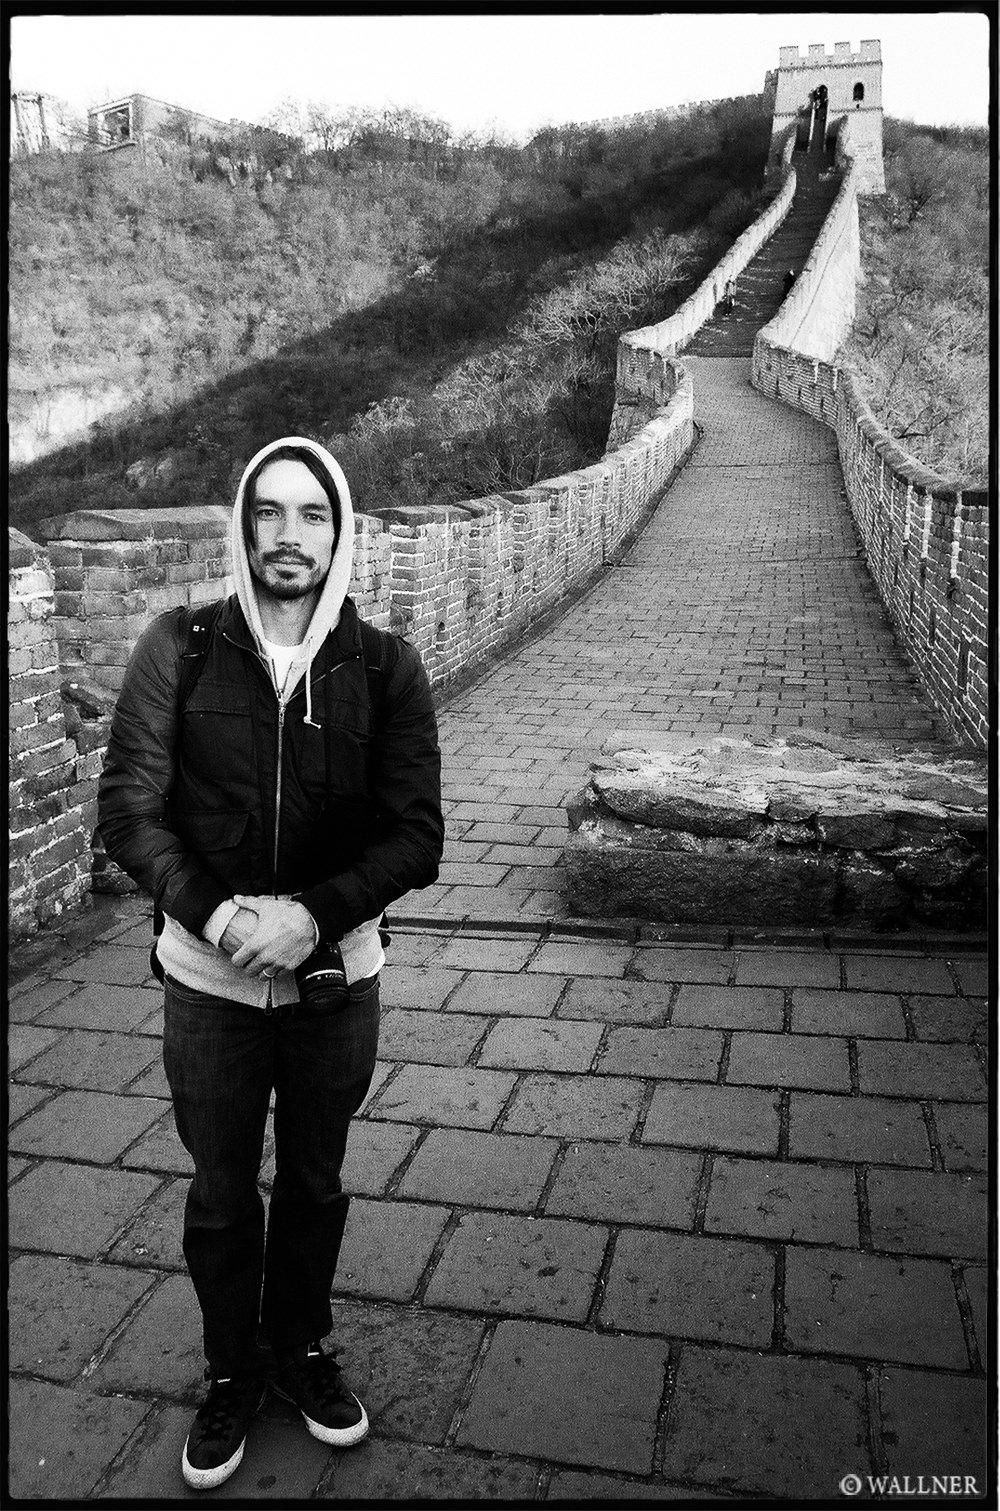 35mmPatrikWallner_Beijing_GreatWallKennyA_LOWQ-1